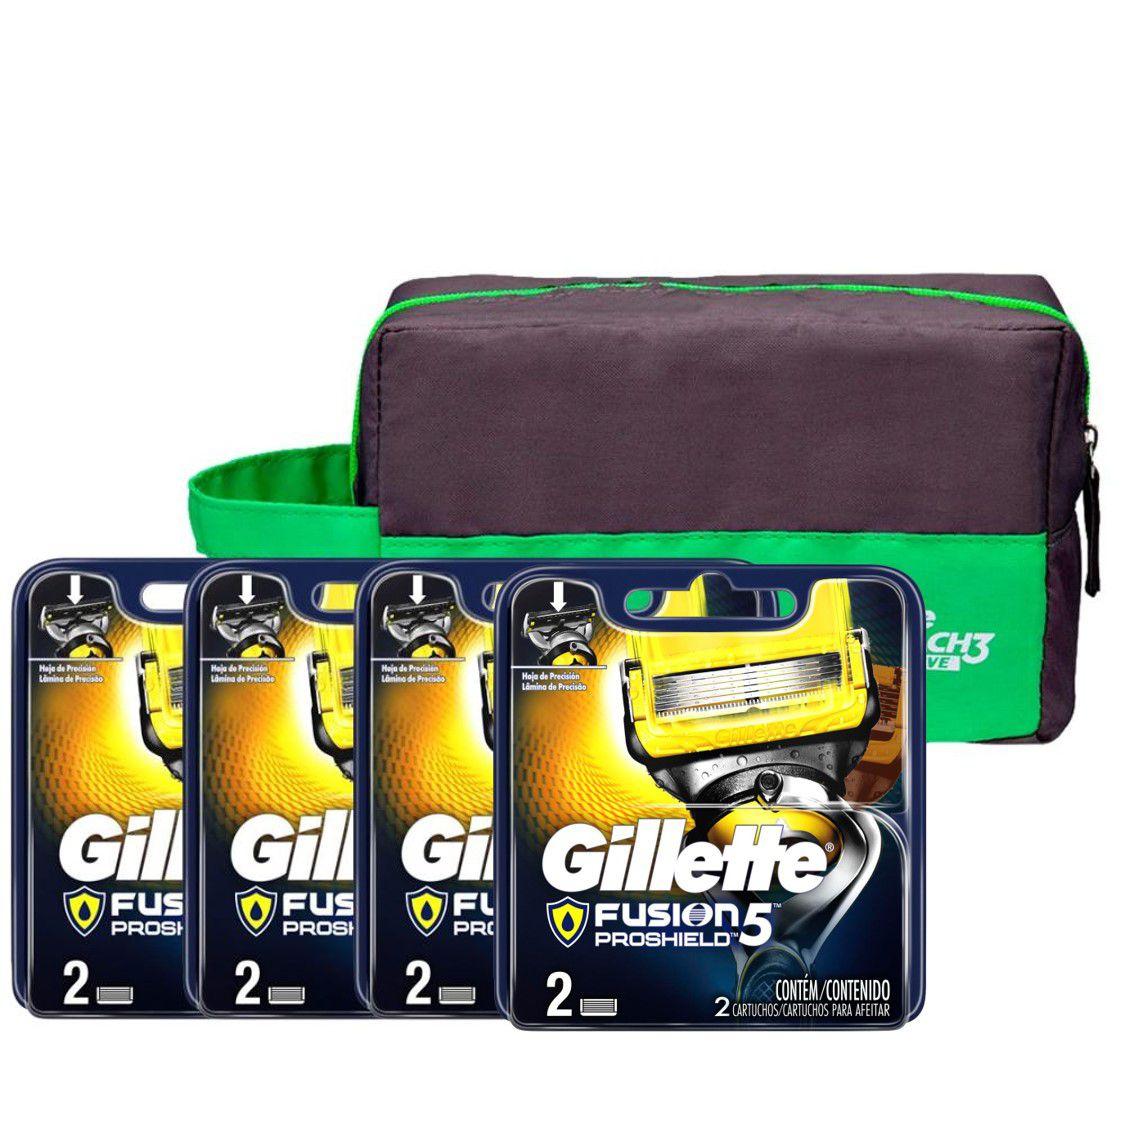 Kit Carga Gillette Fusion Proshield com 8 Unidades + Necessaire